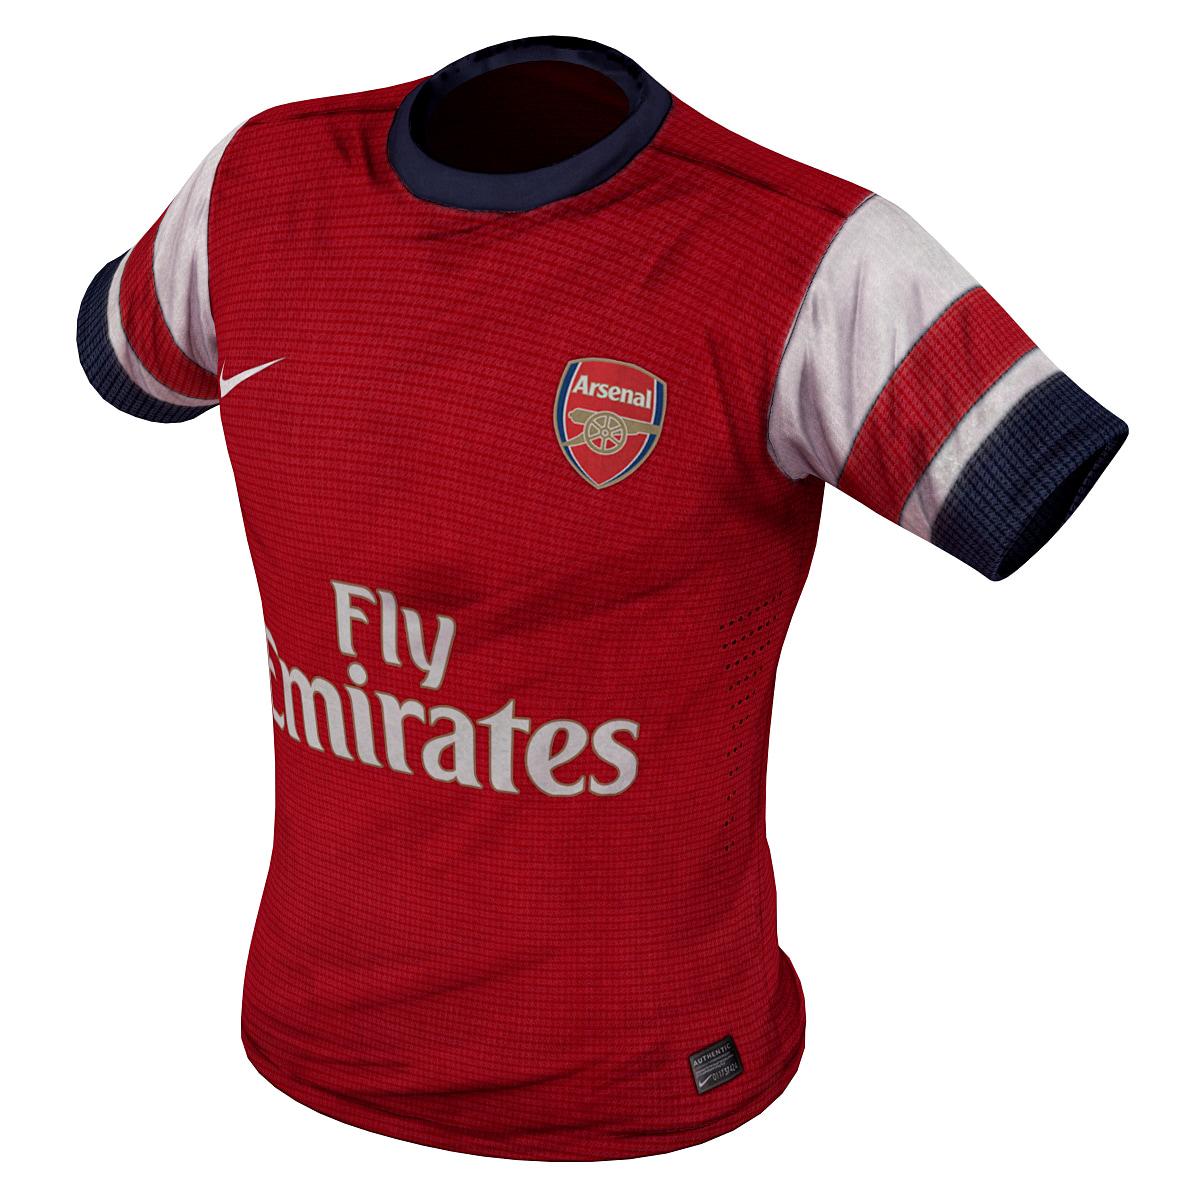 3ds max soccer shirt